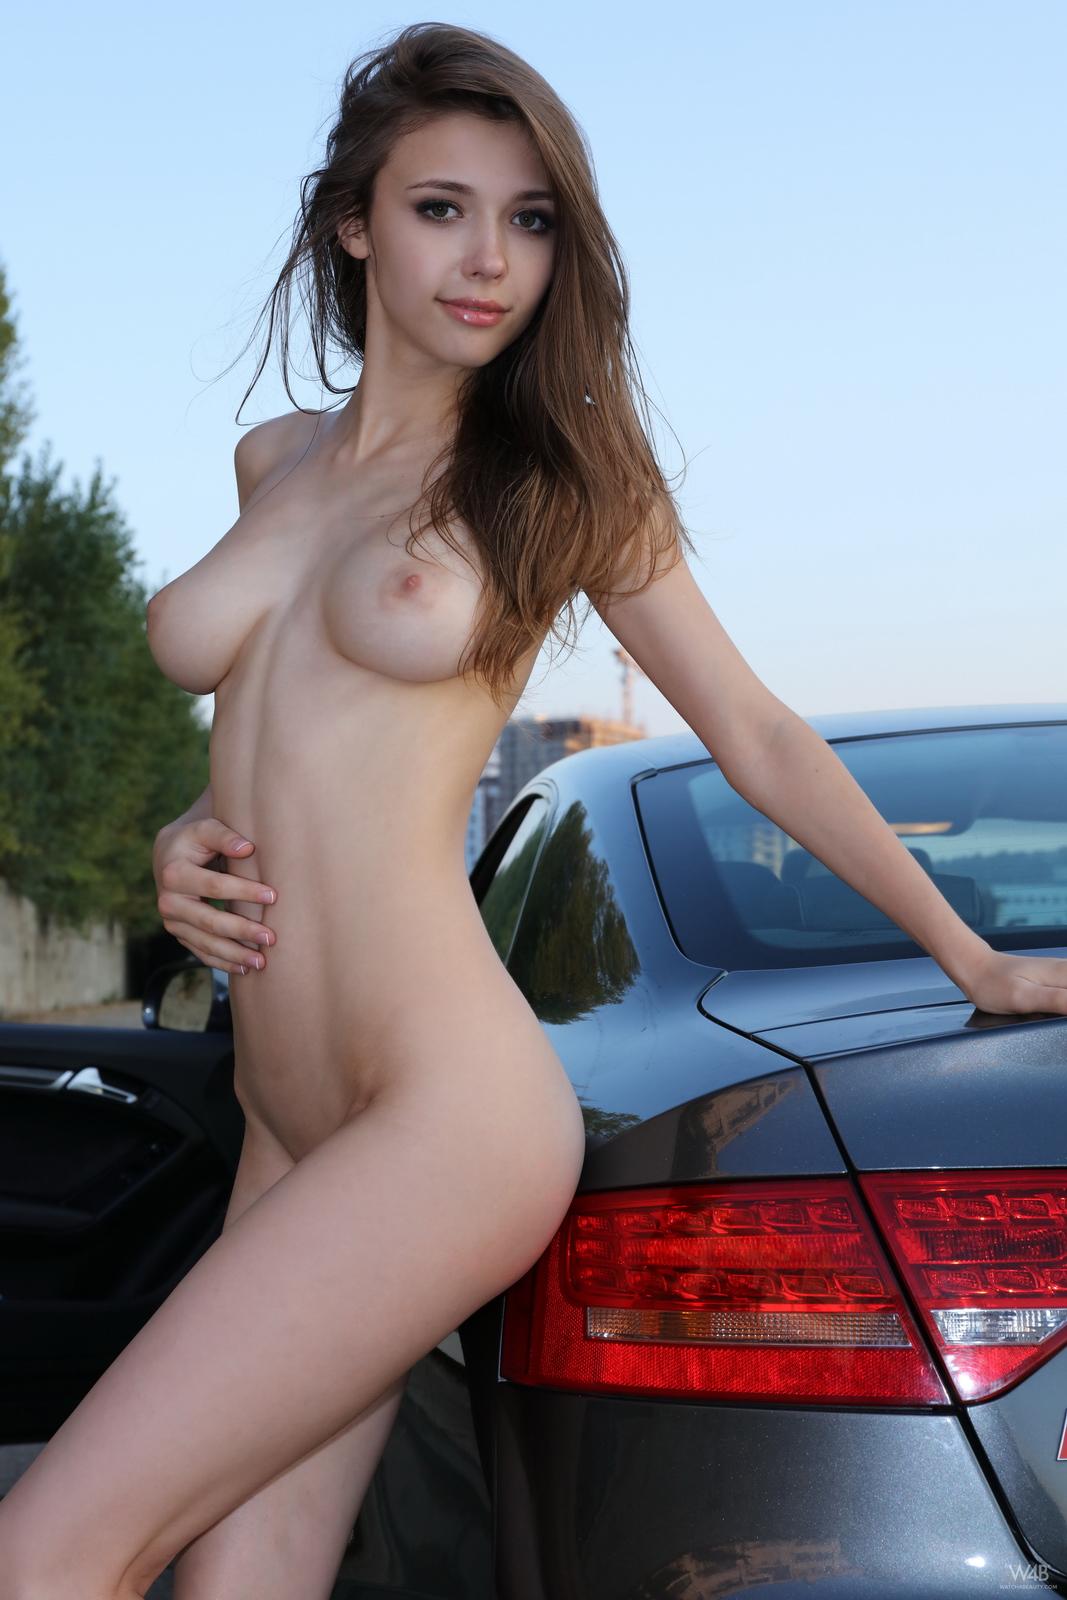 https://redbust.com/stuff/mila-azul-audi-rs5/milla-nude-audi-rs5-cars-pussy-watch4beauty-41.jpg